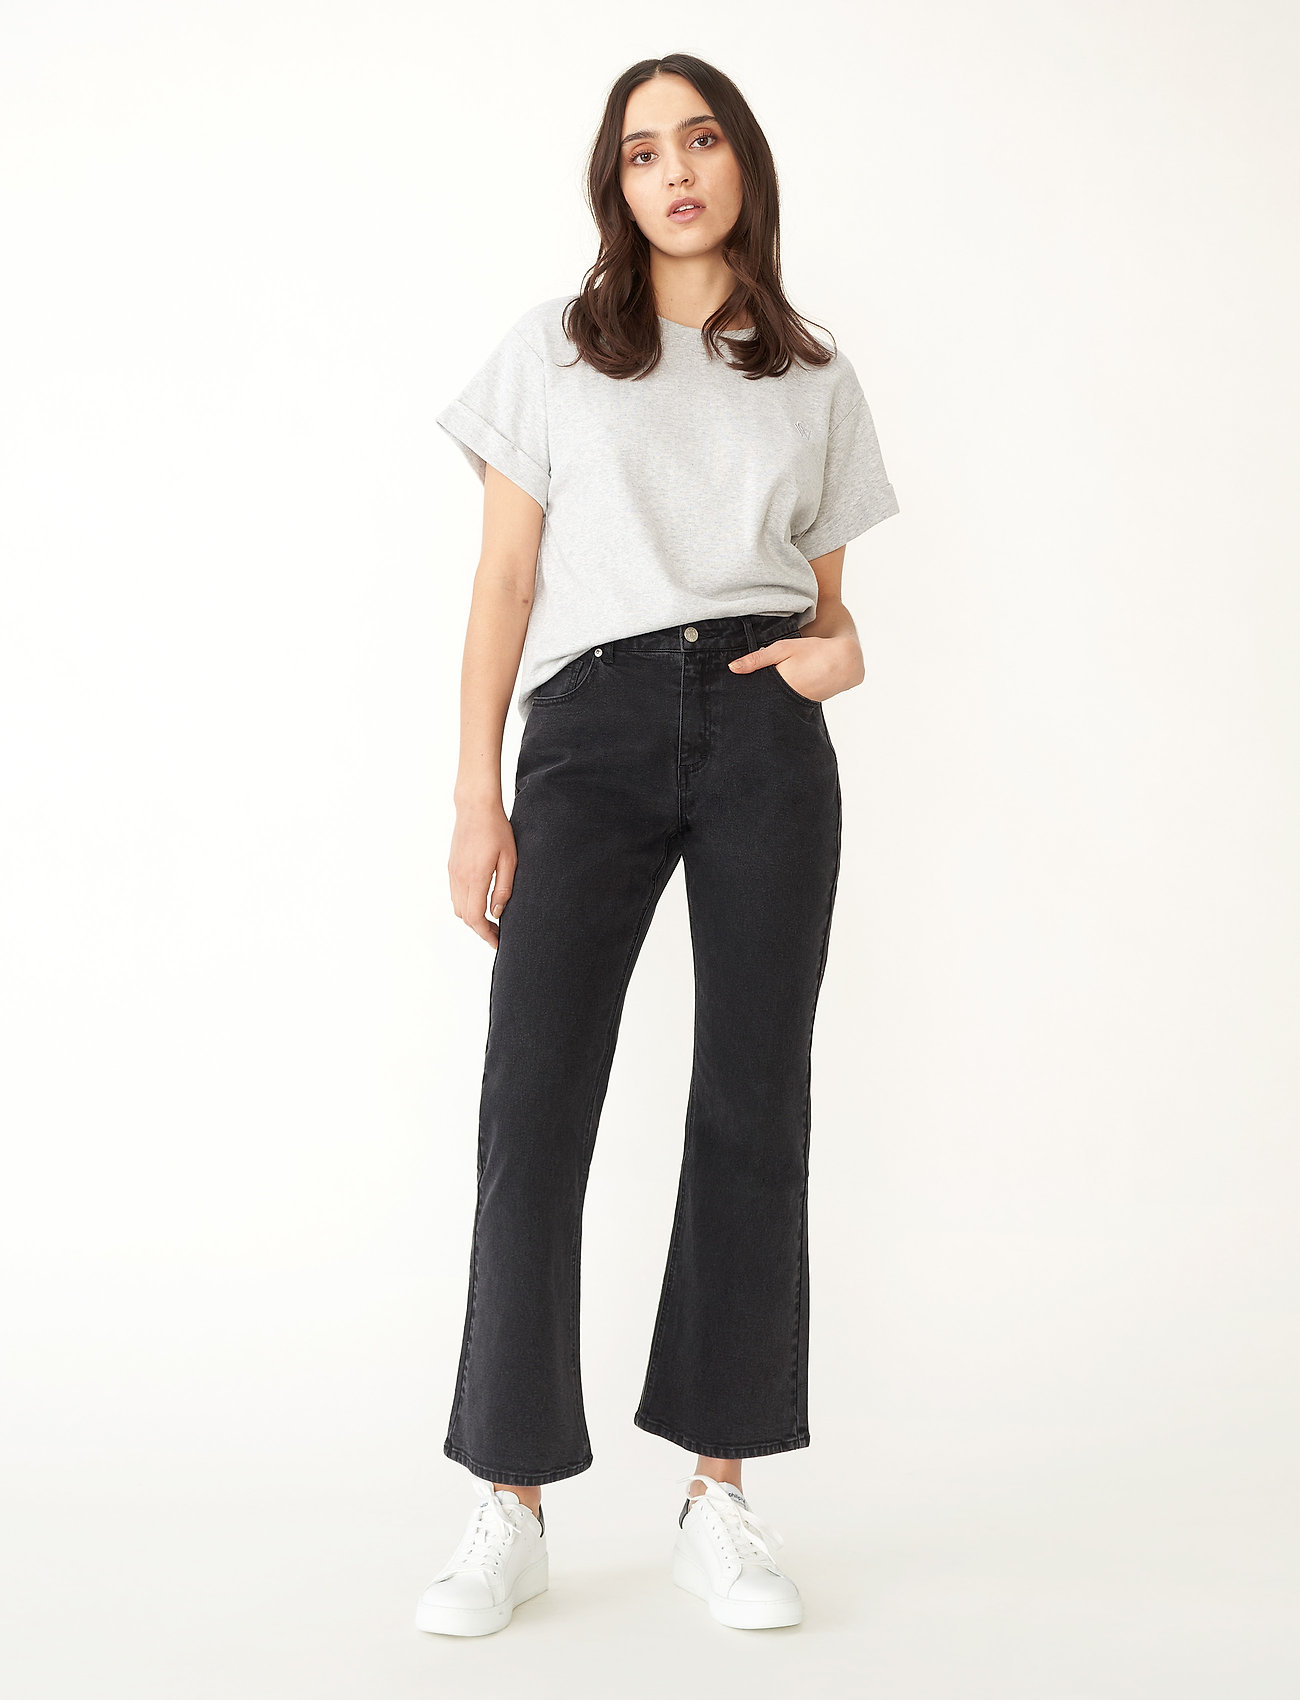 Carin Wester - Palmer - flared jeans - black/dk grey - 0